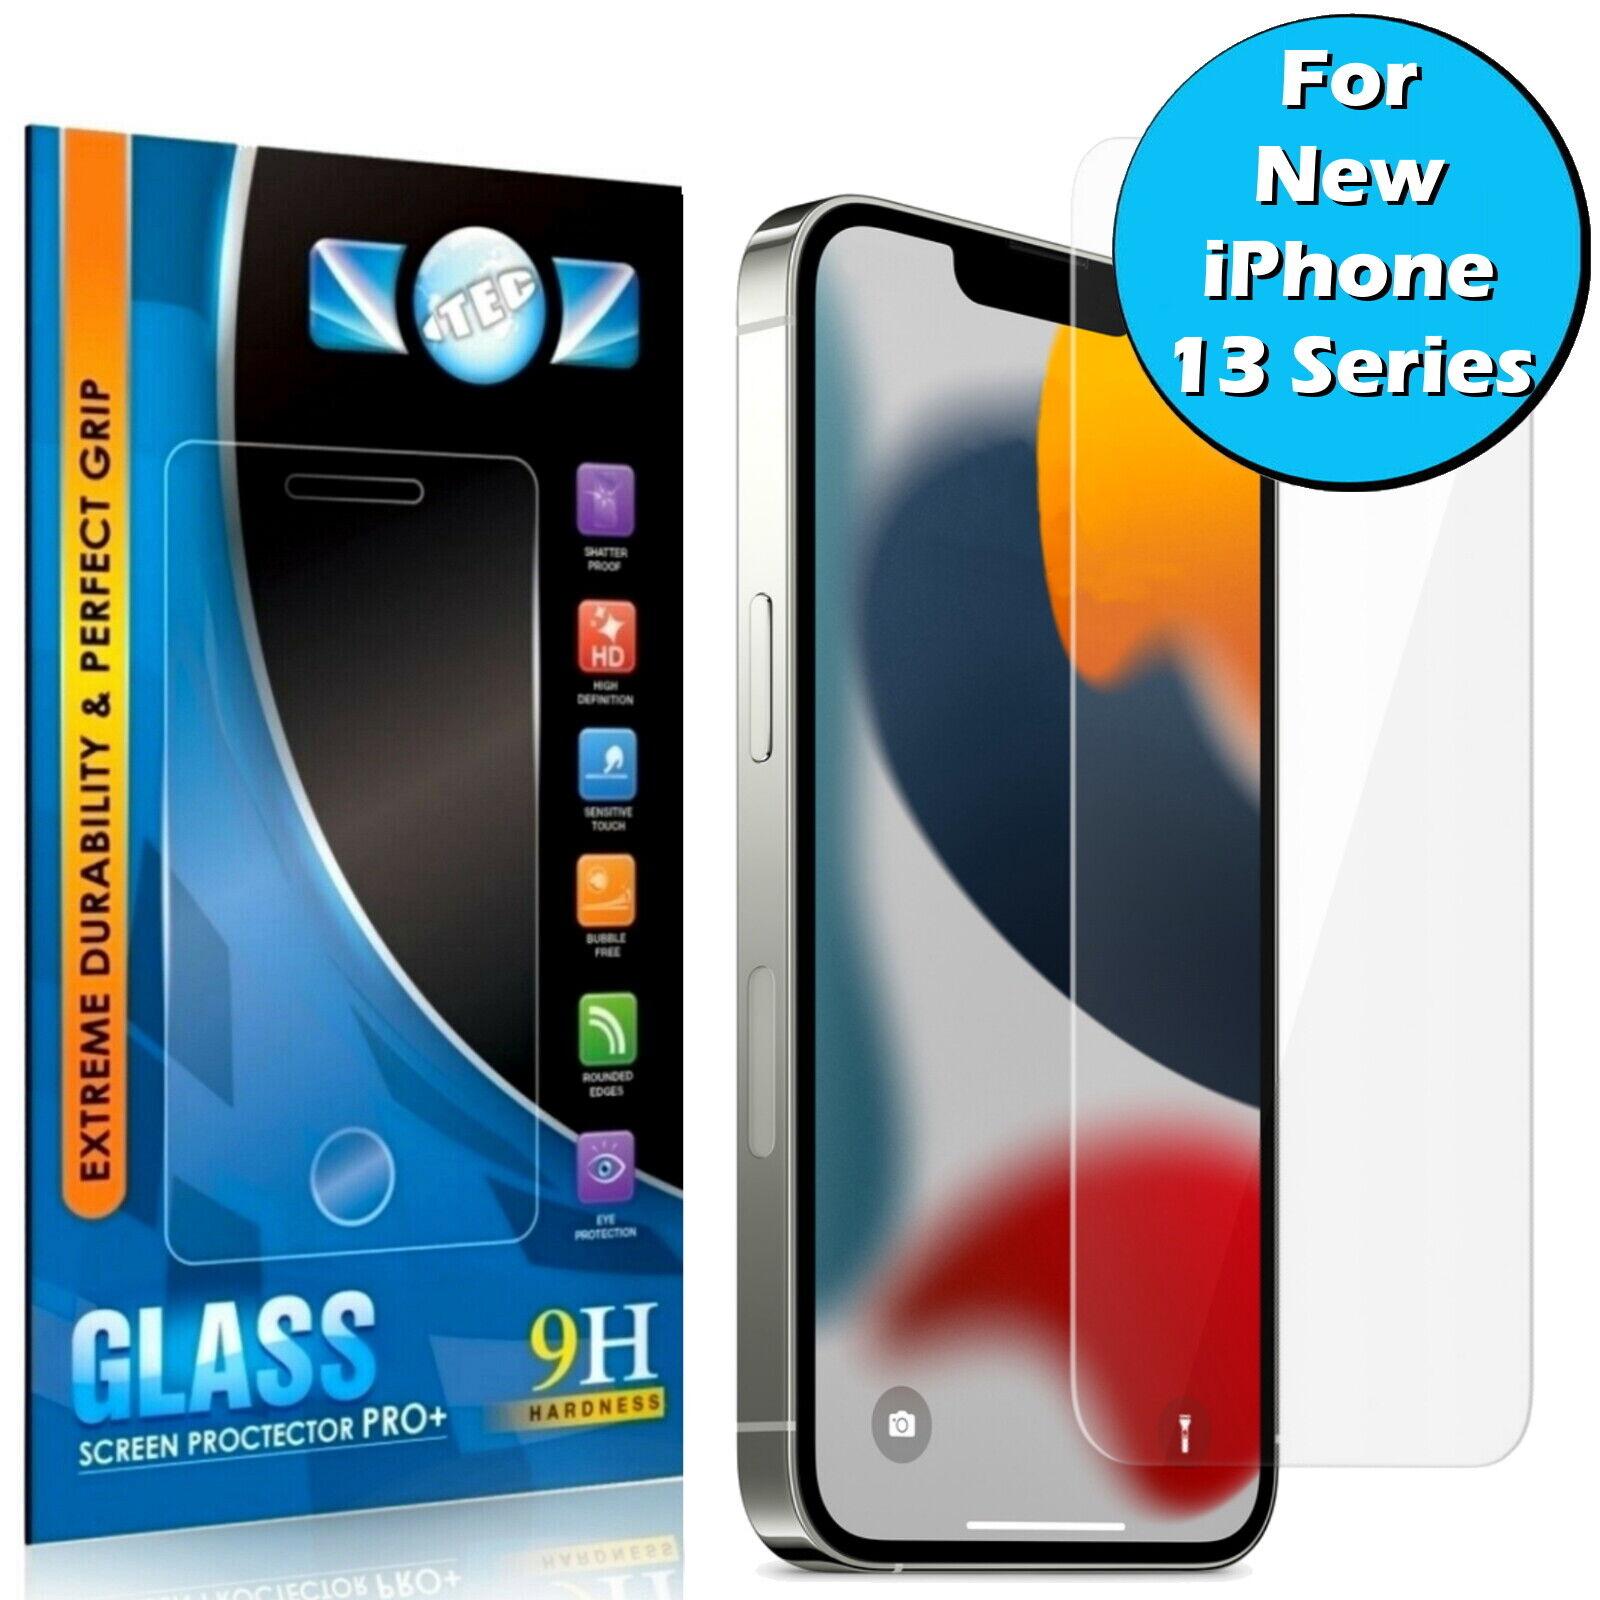 Ebay's Top Selling iTEC Glass